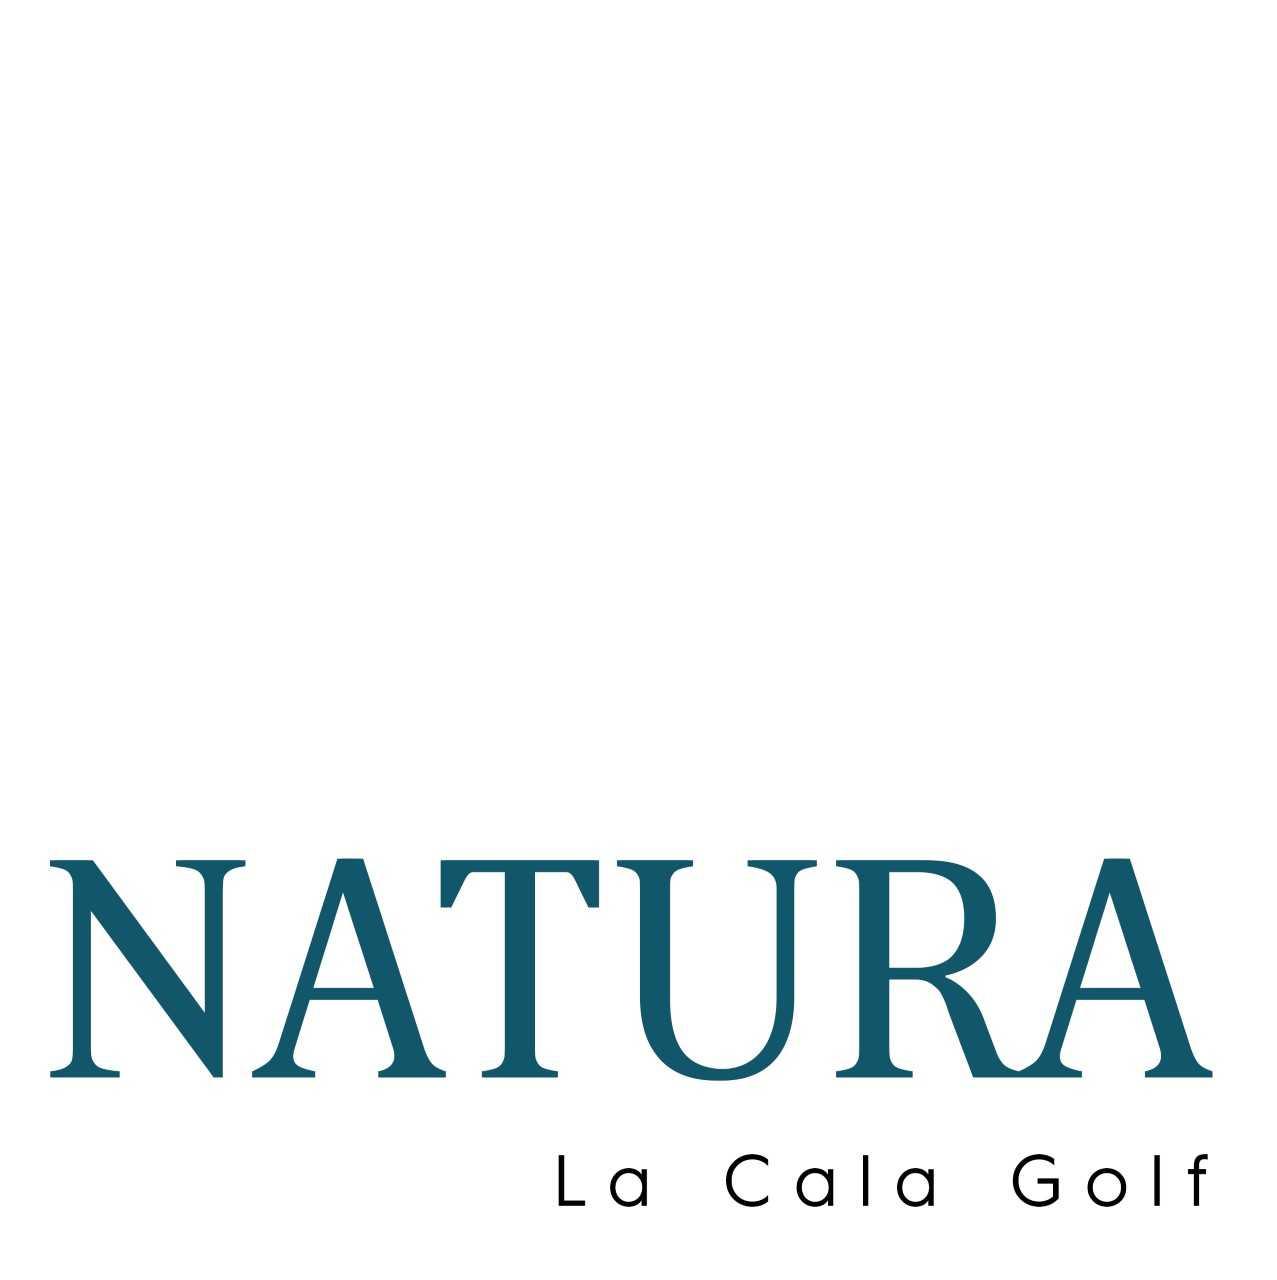 Natura, 40 townhouses La Cala Golf Mijas, vanaf 465.000 €